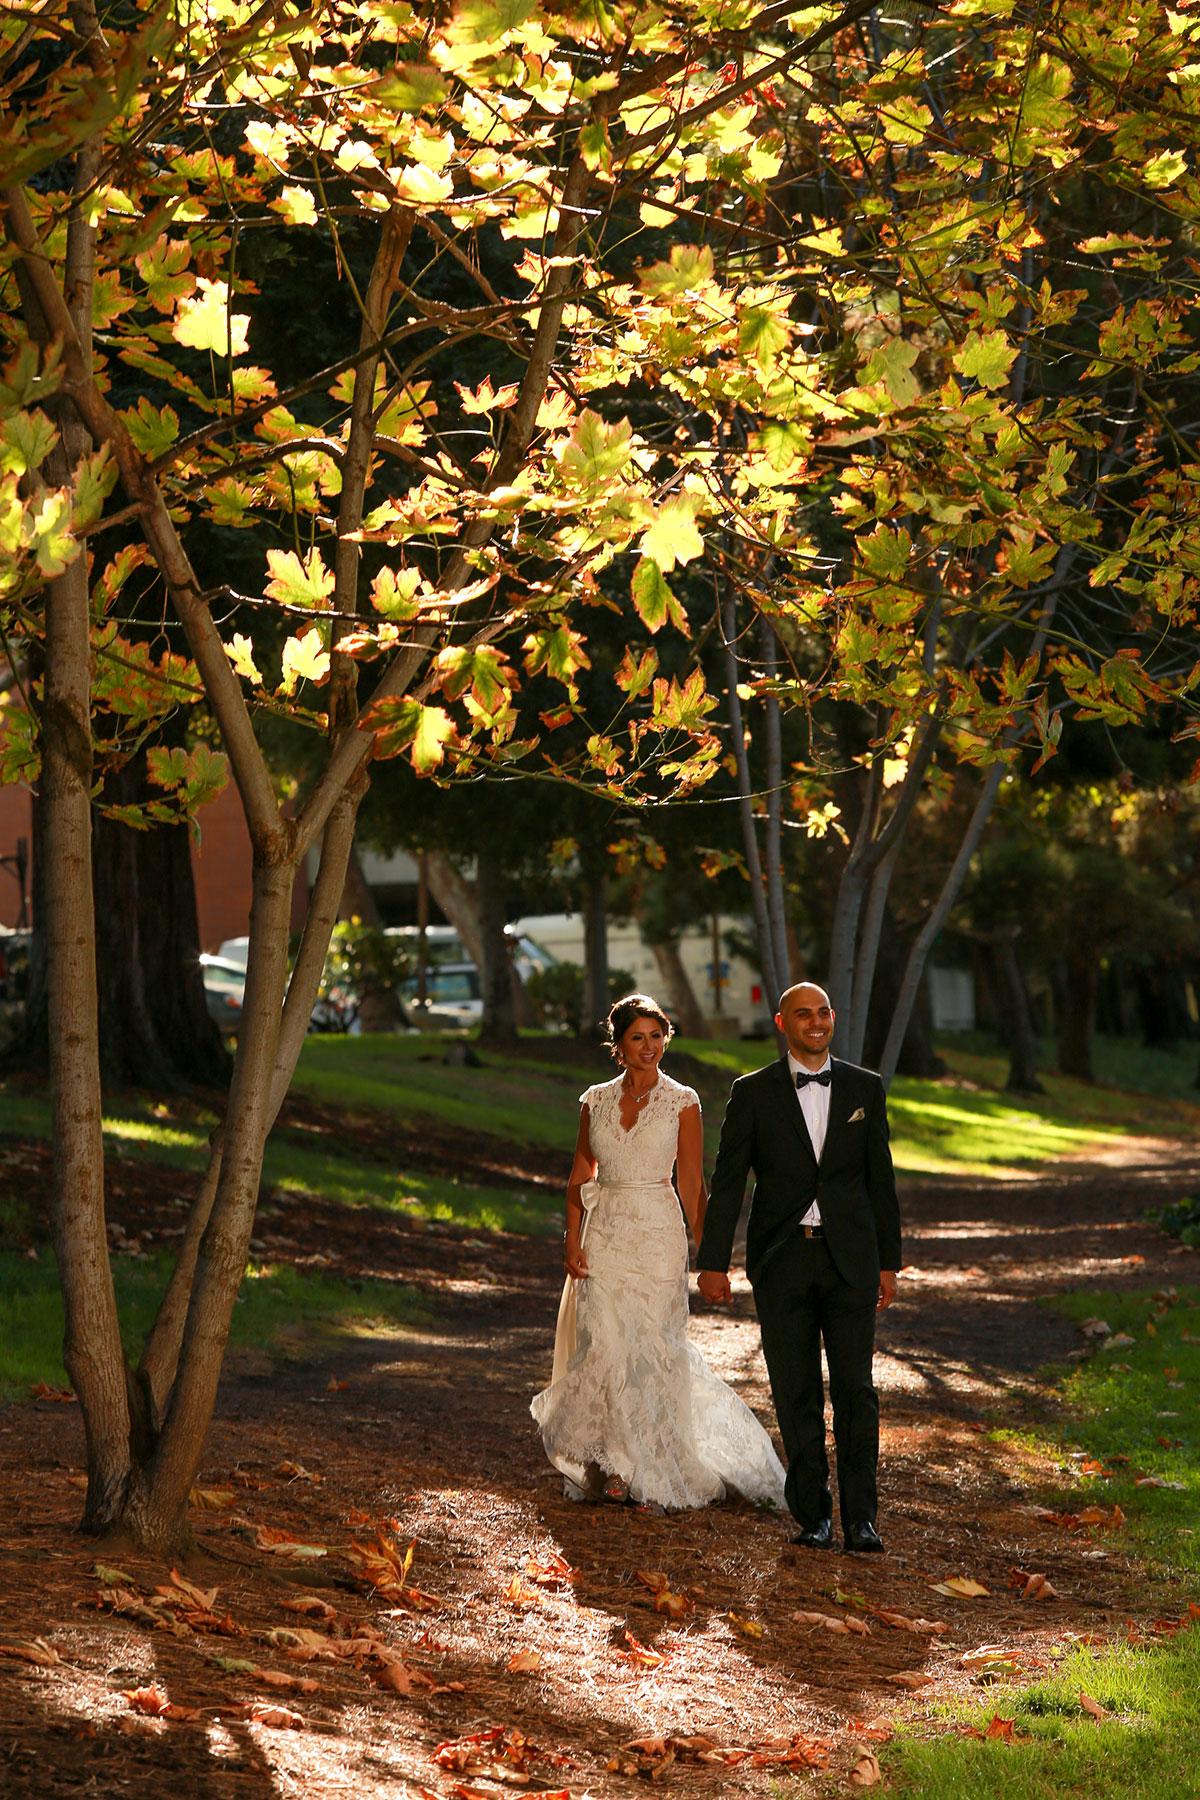 Atefeh_Kambiz_Wedding_Chicago_002.jpg